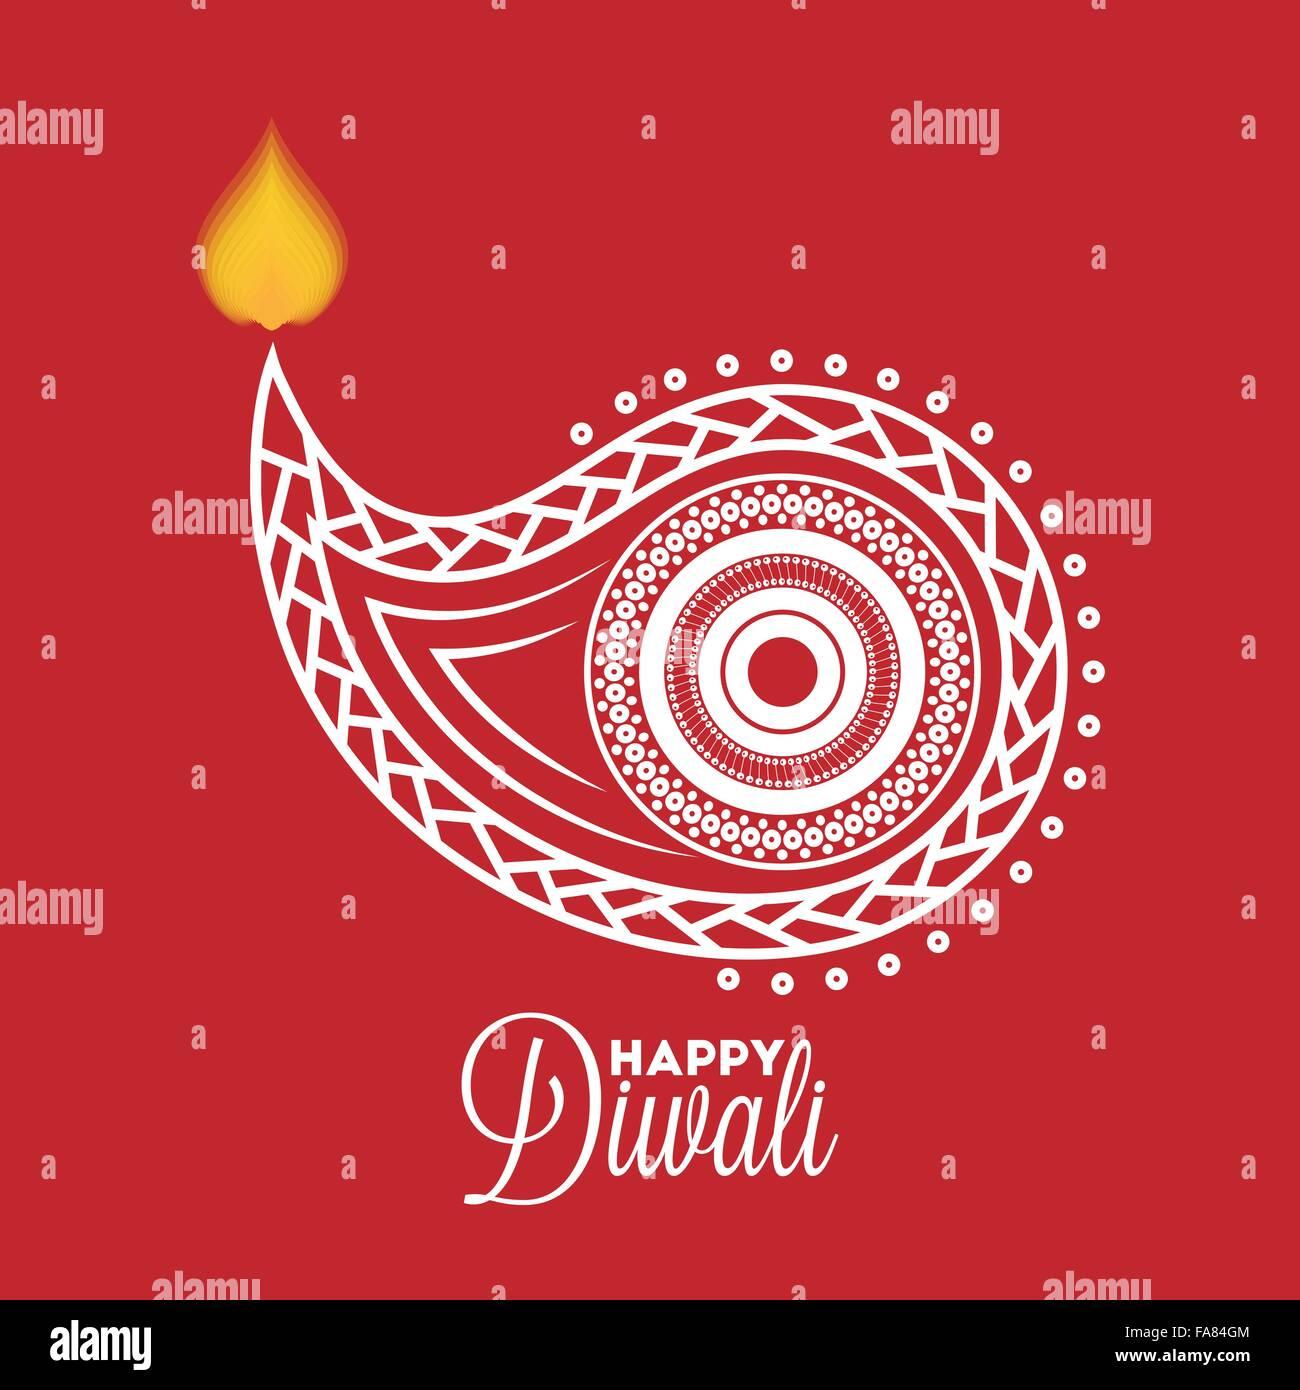 Diwali diya oil lamp for your greeting card design stock vector art diwali diya oil lamp for your greeting card design m4hsunfo